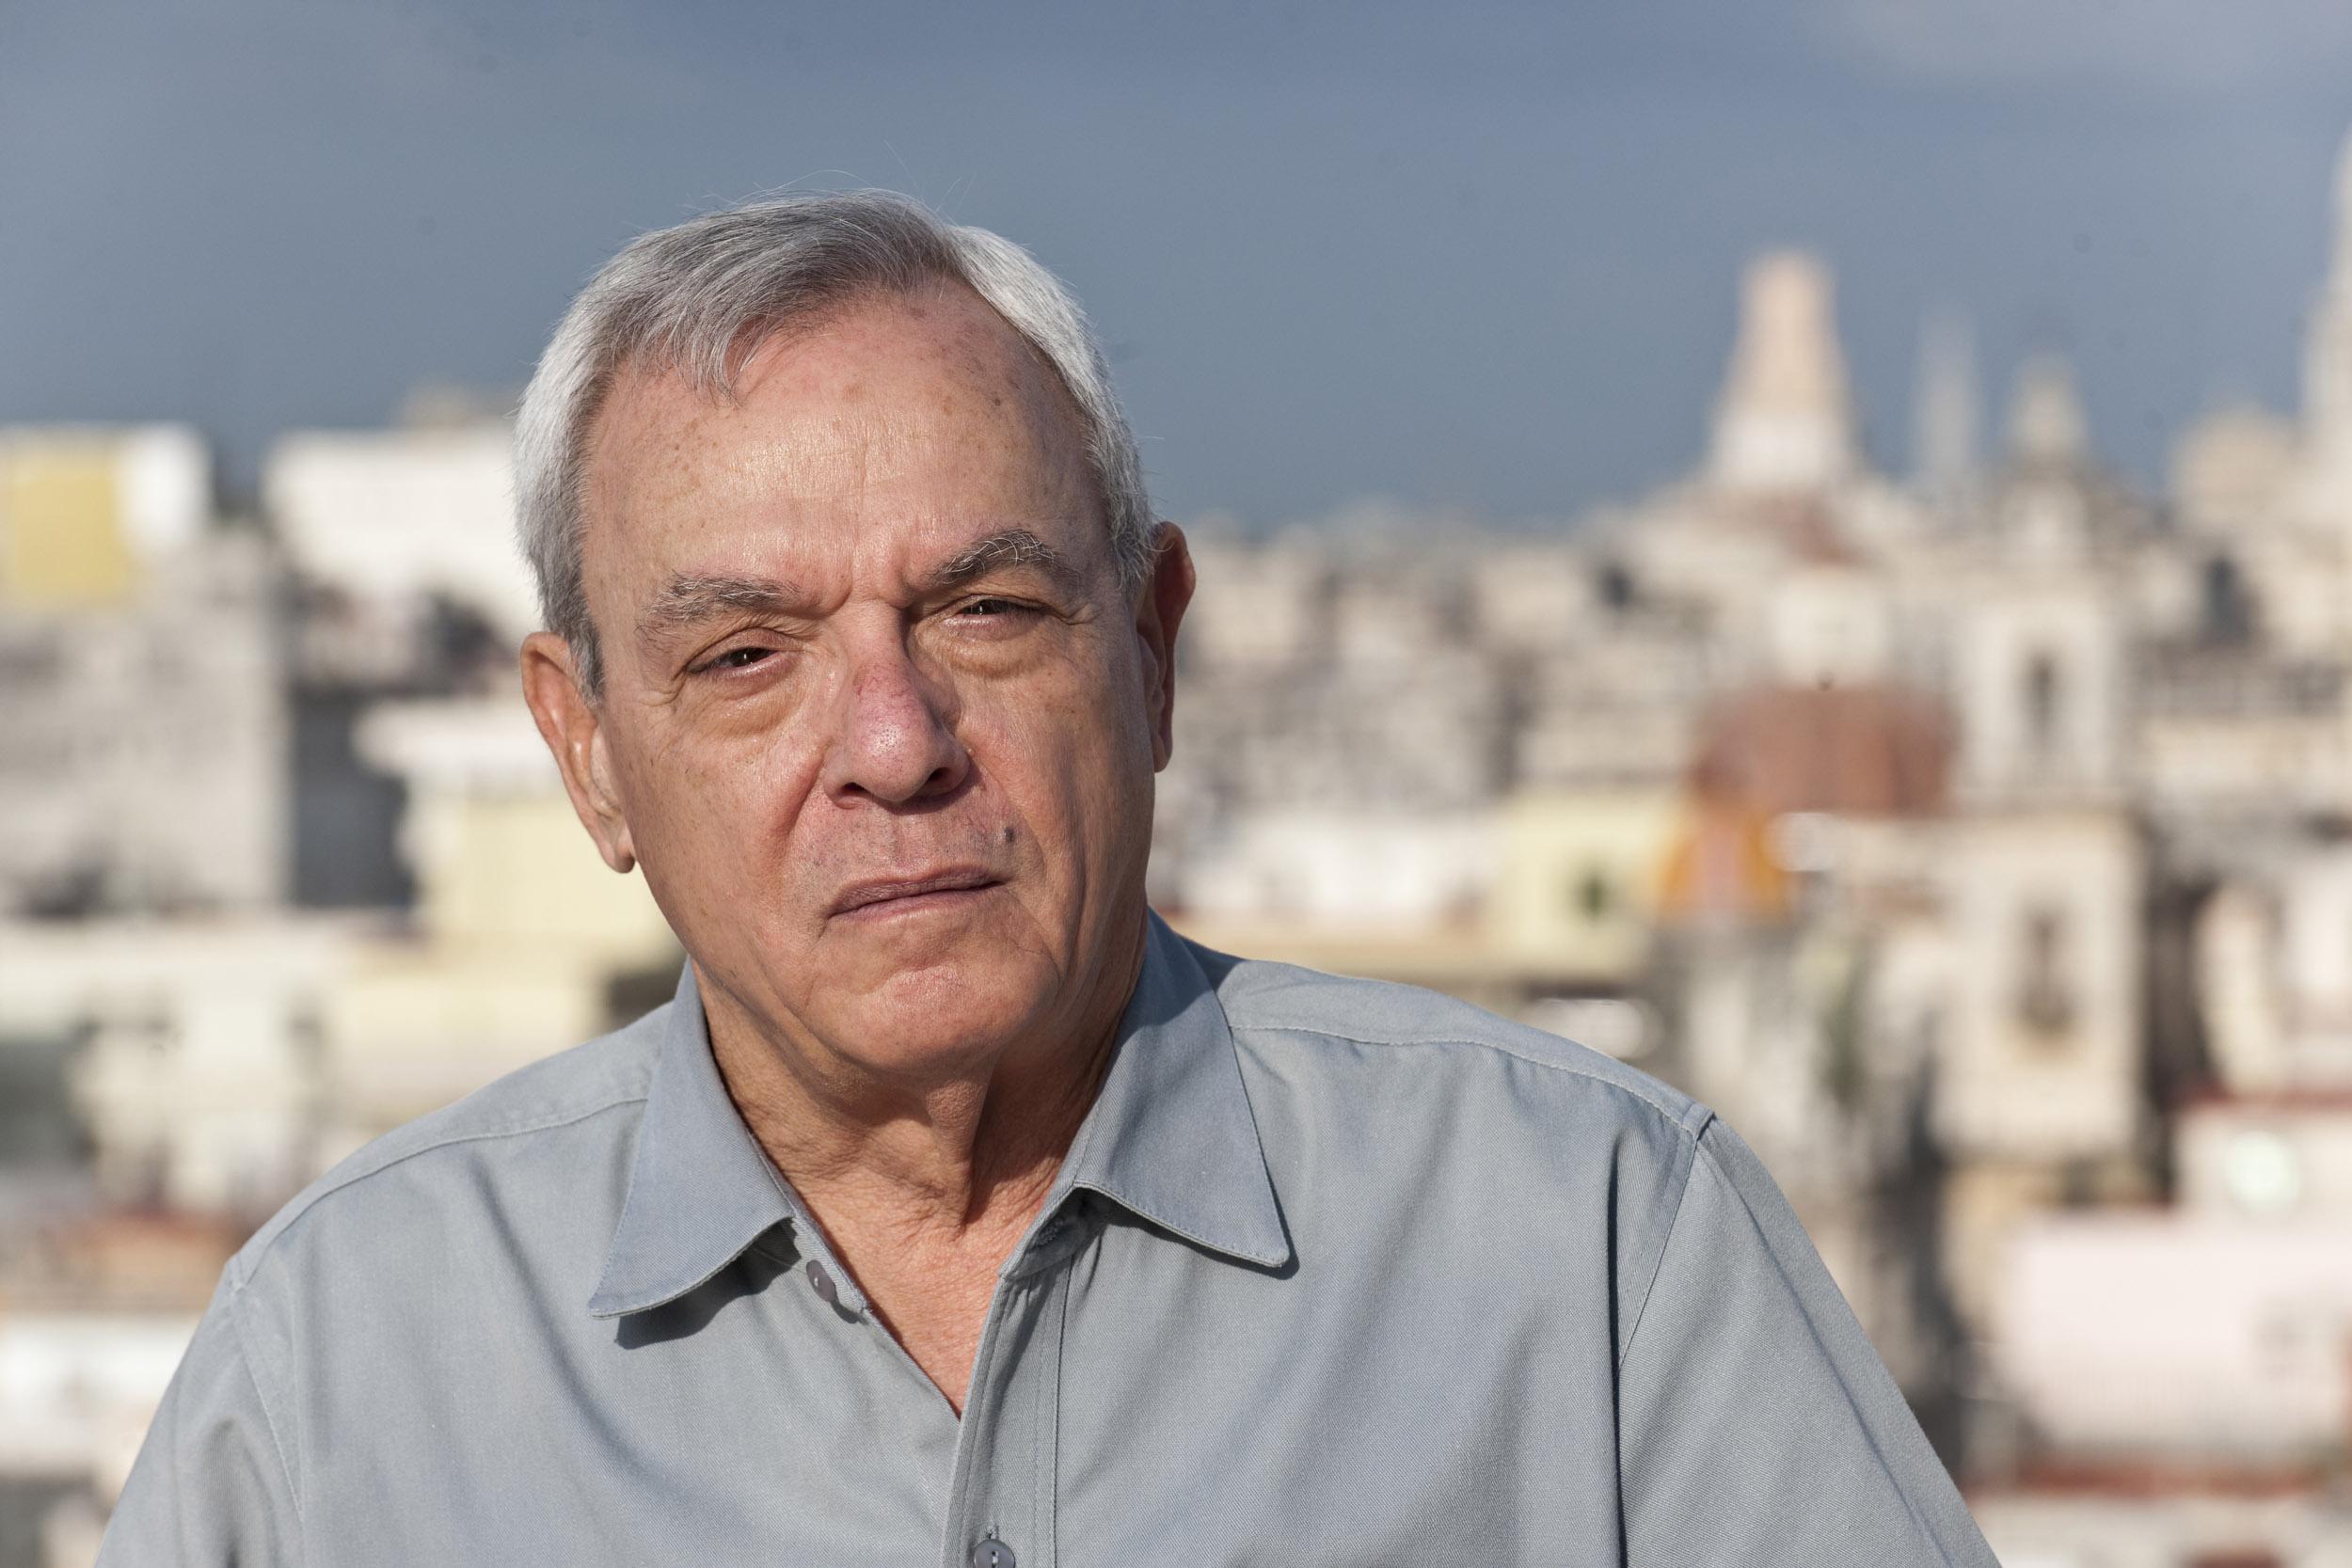 Eusebio Leal, historian - Illuminated Cuba - Hector Garrido, Aerial and human photography